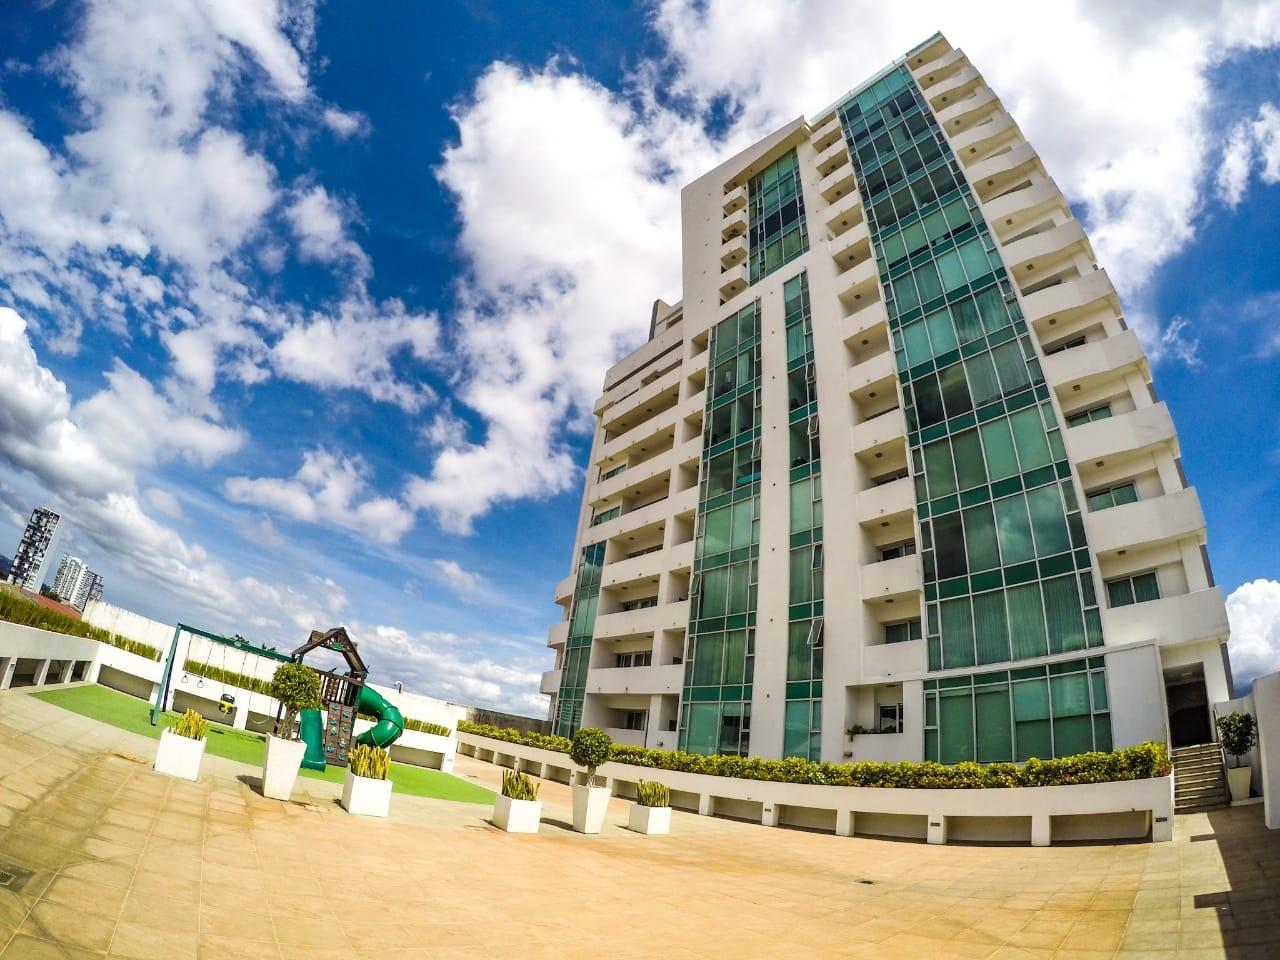 Alquiler Apartamento Torre Roble Sabana, full amenidades